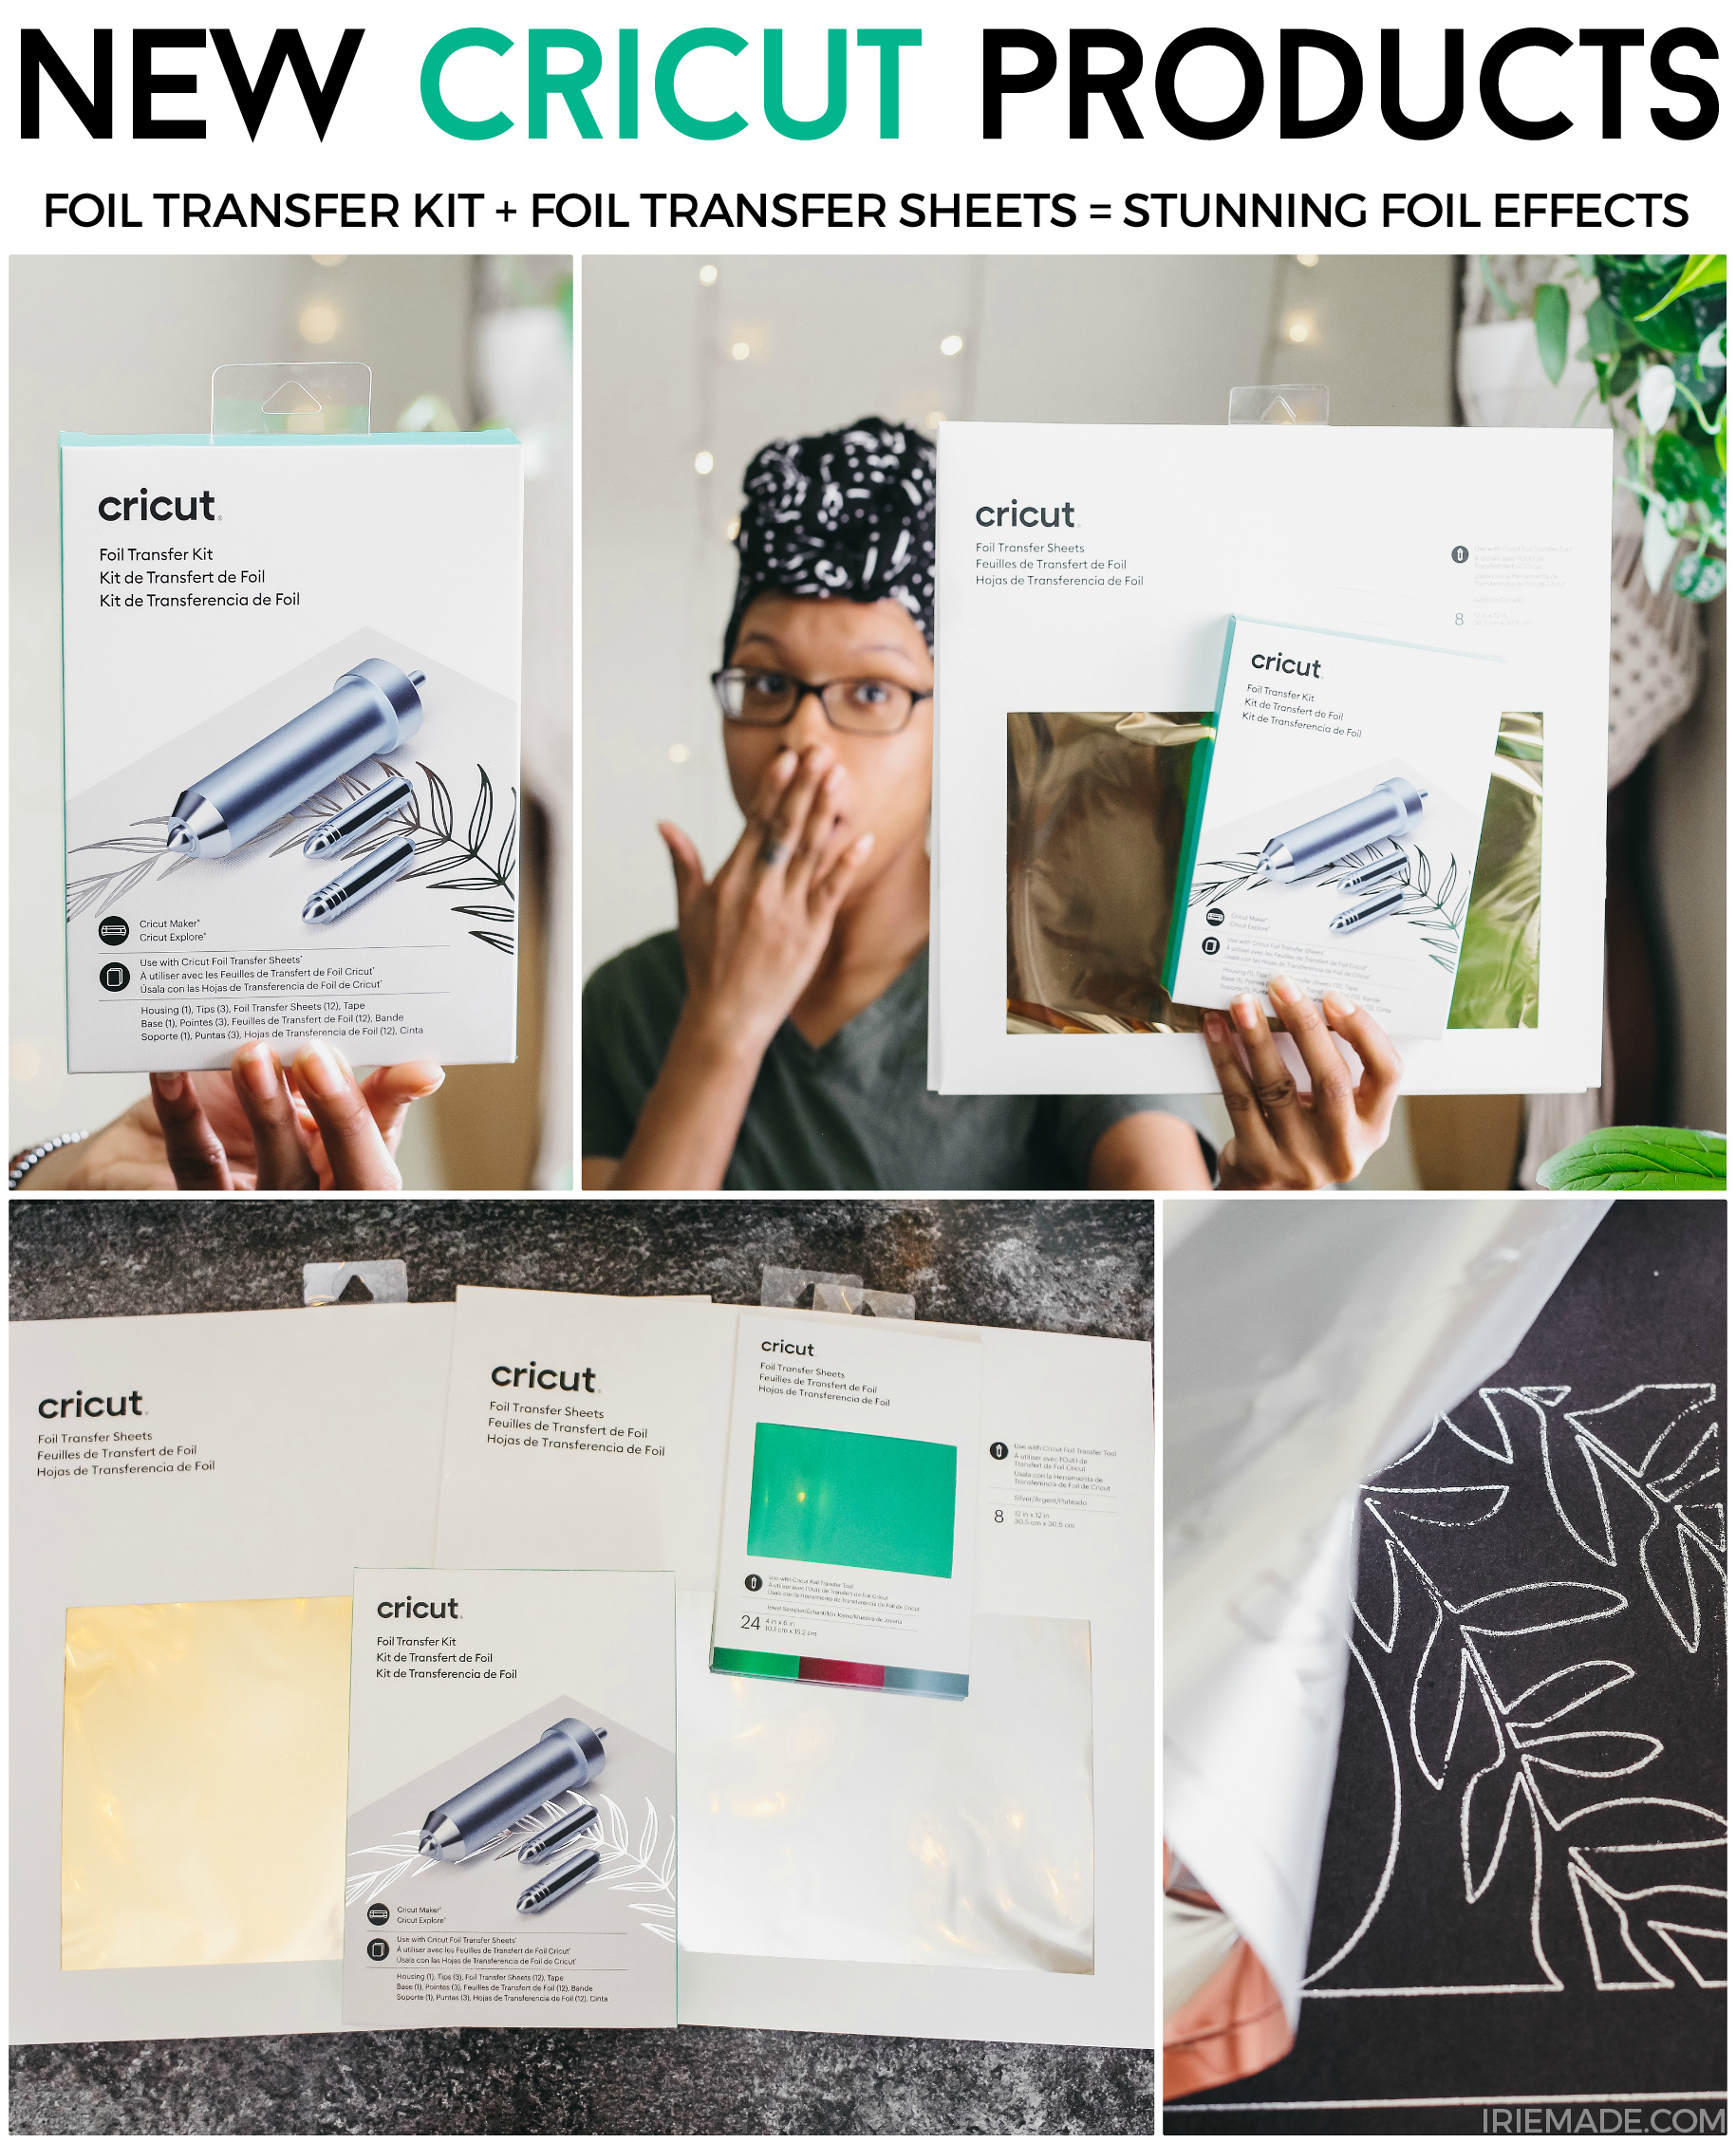 A Look at Cricut's Foil Transfer Kit